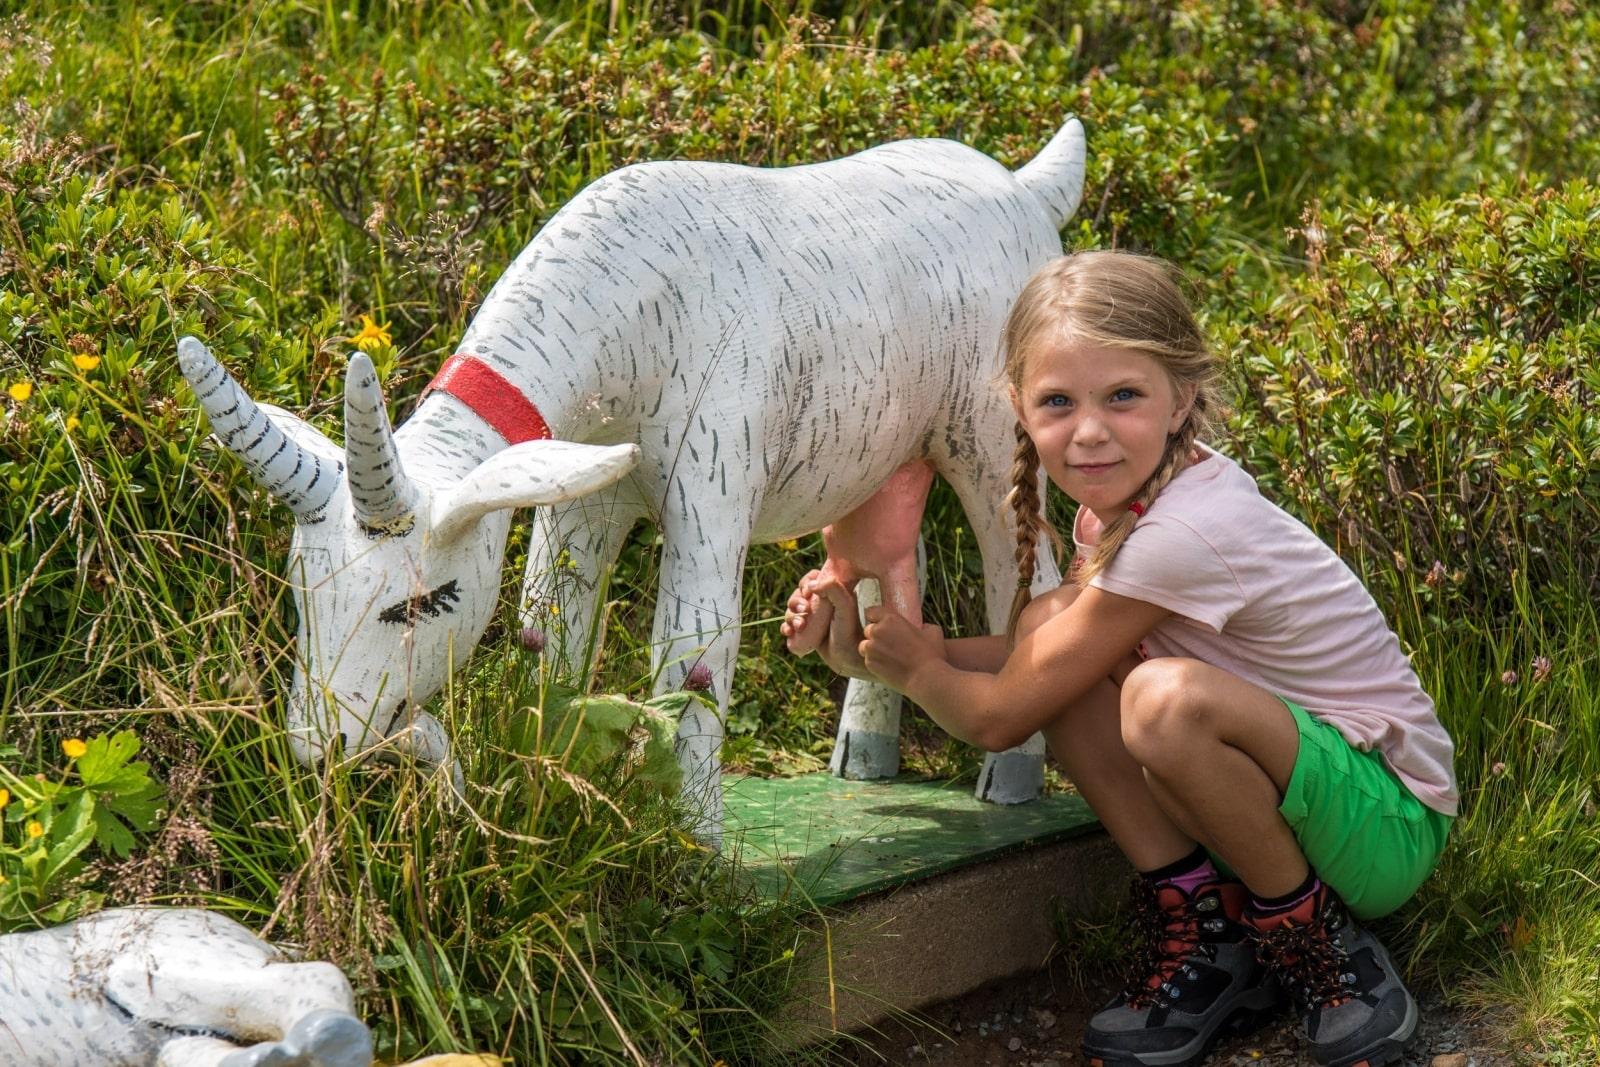 Heidi-Chalet-Falkert-Heidialm-Falkertsee-Kinder-Park